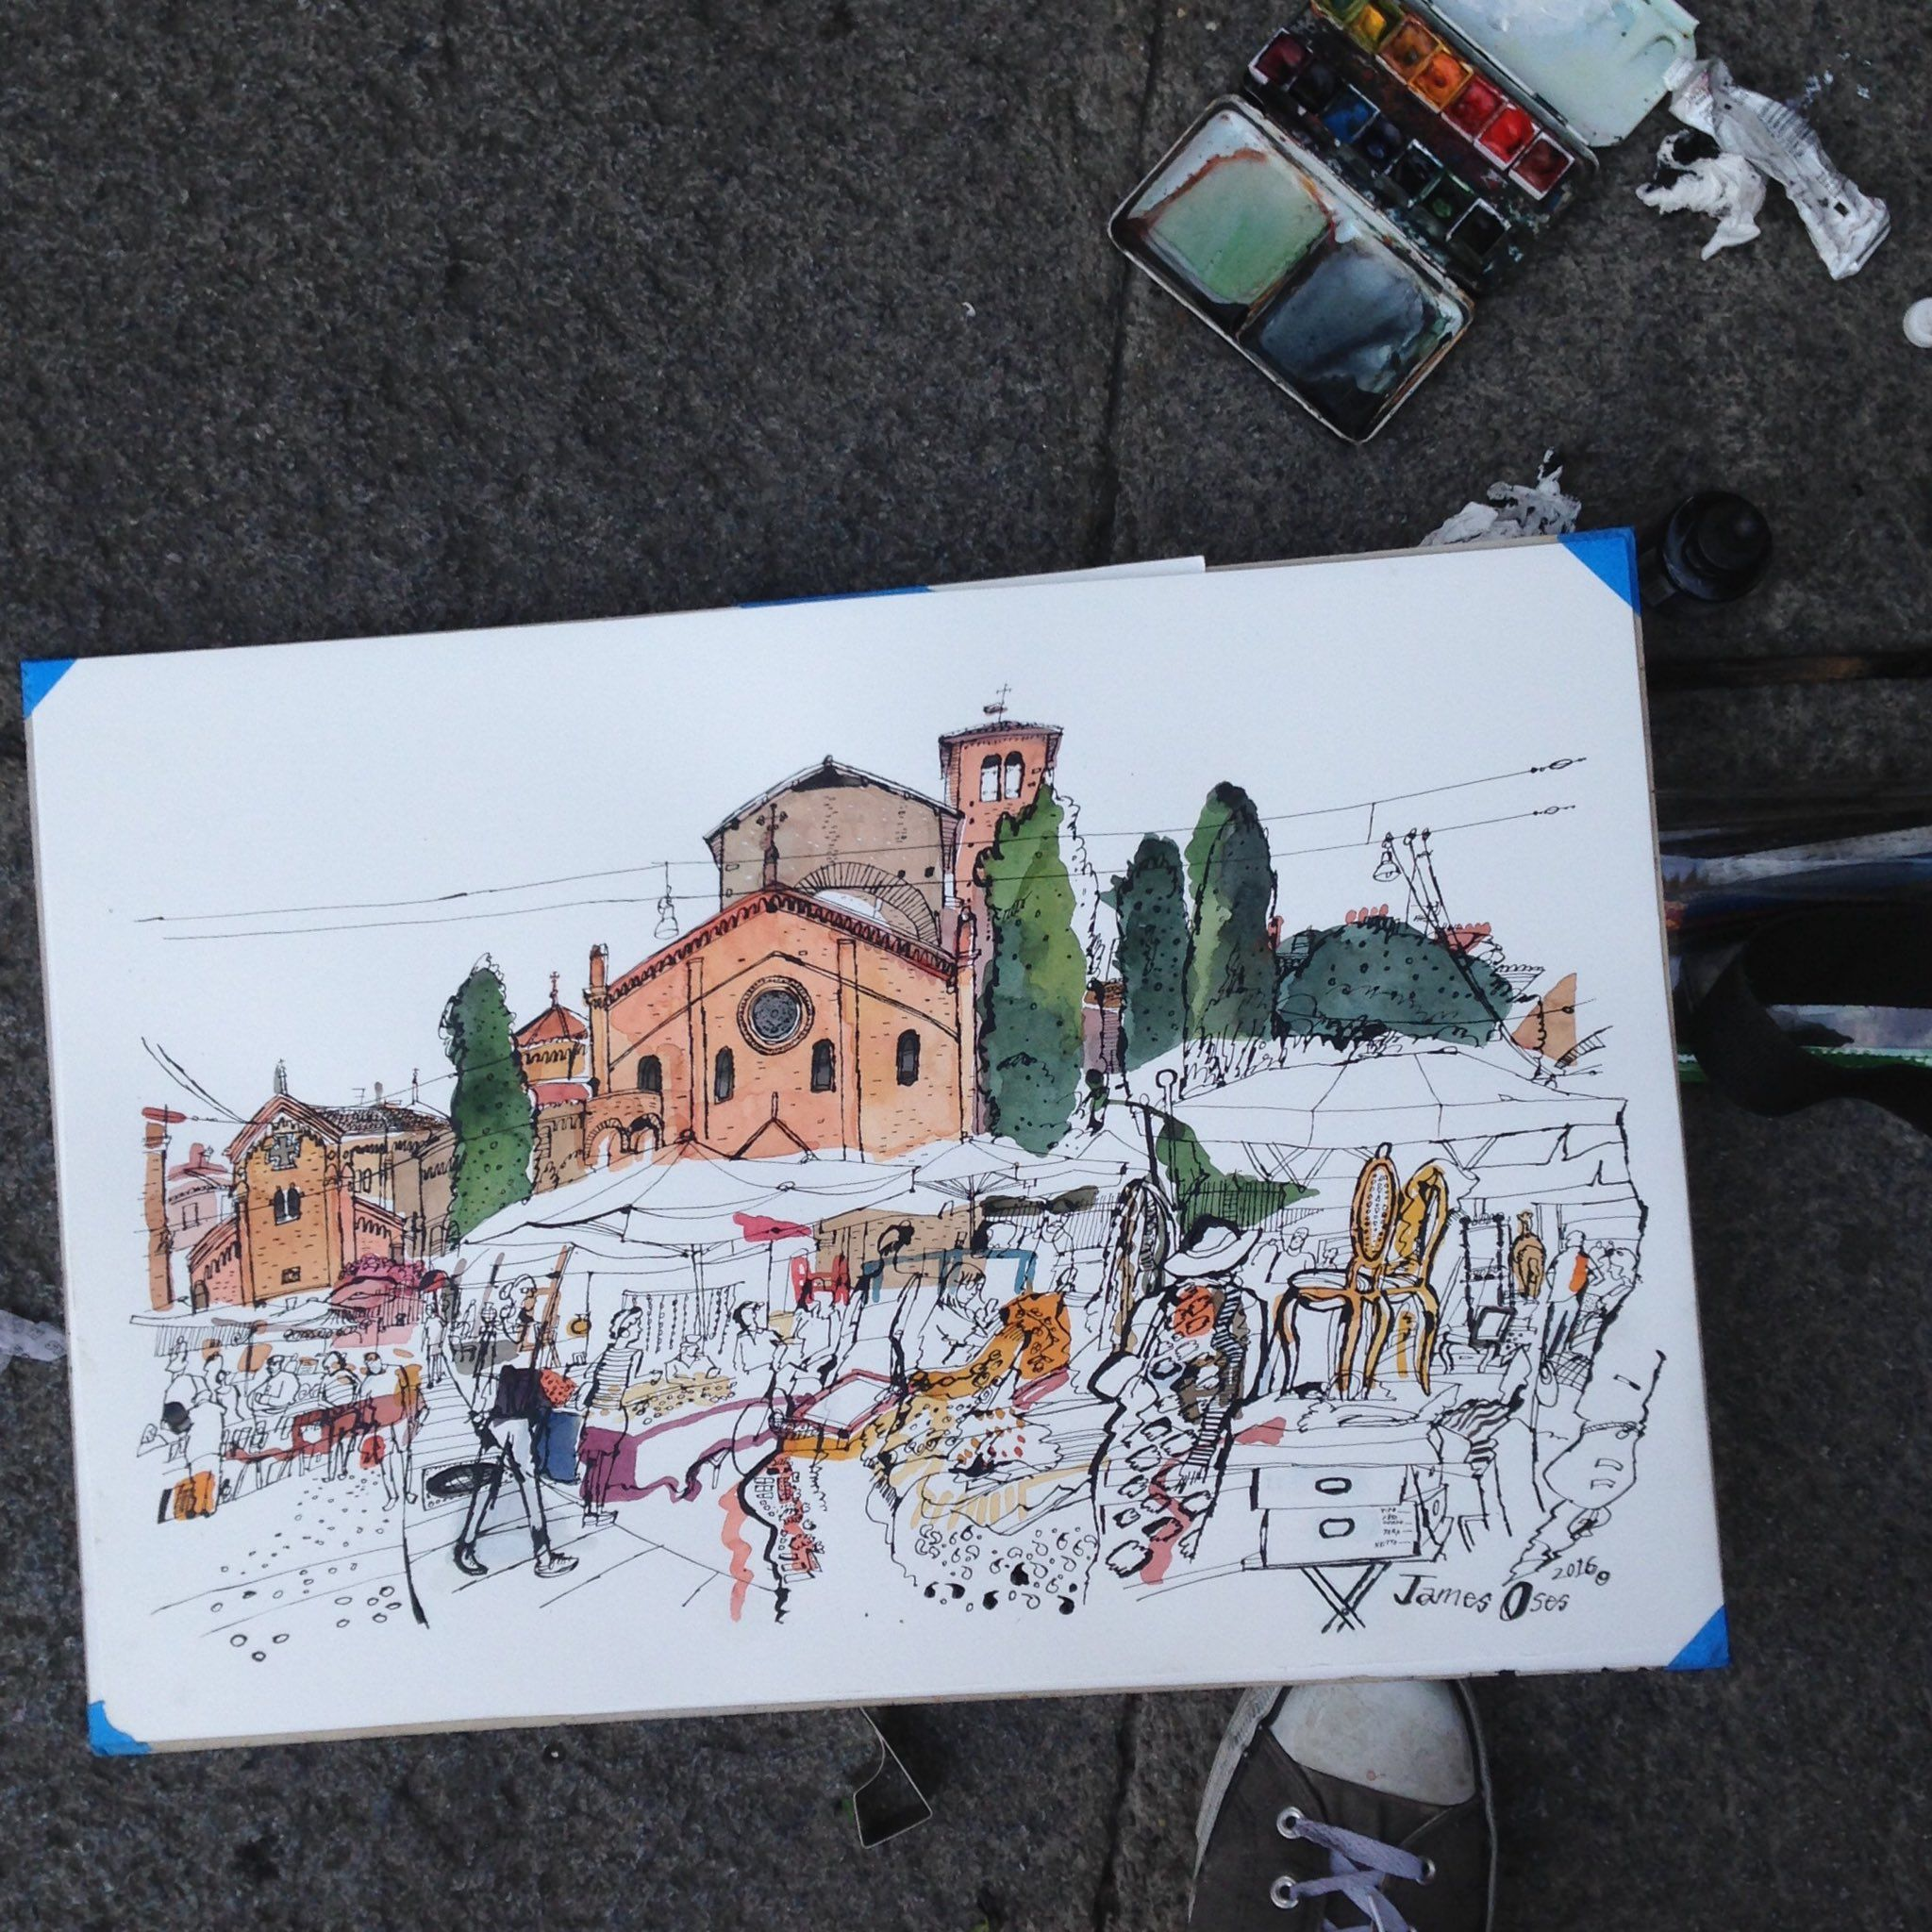 James Oses, Flea Market in Bologna (Piazza Santo Stefano)